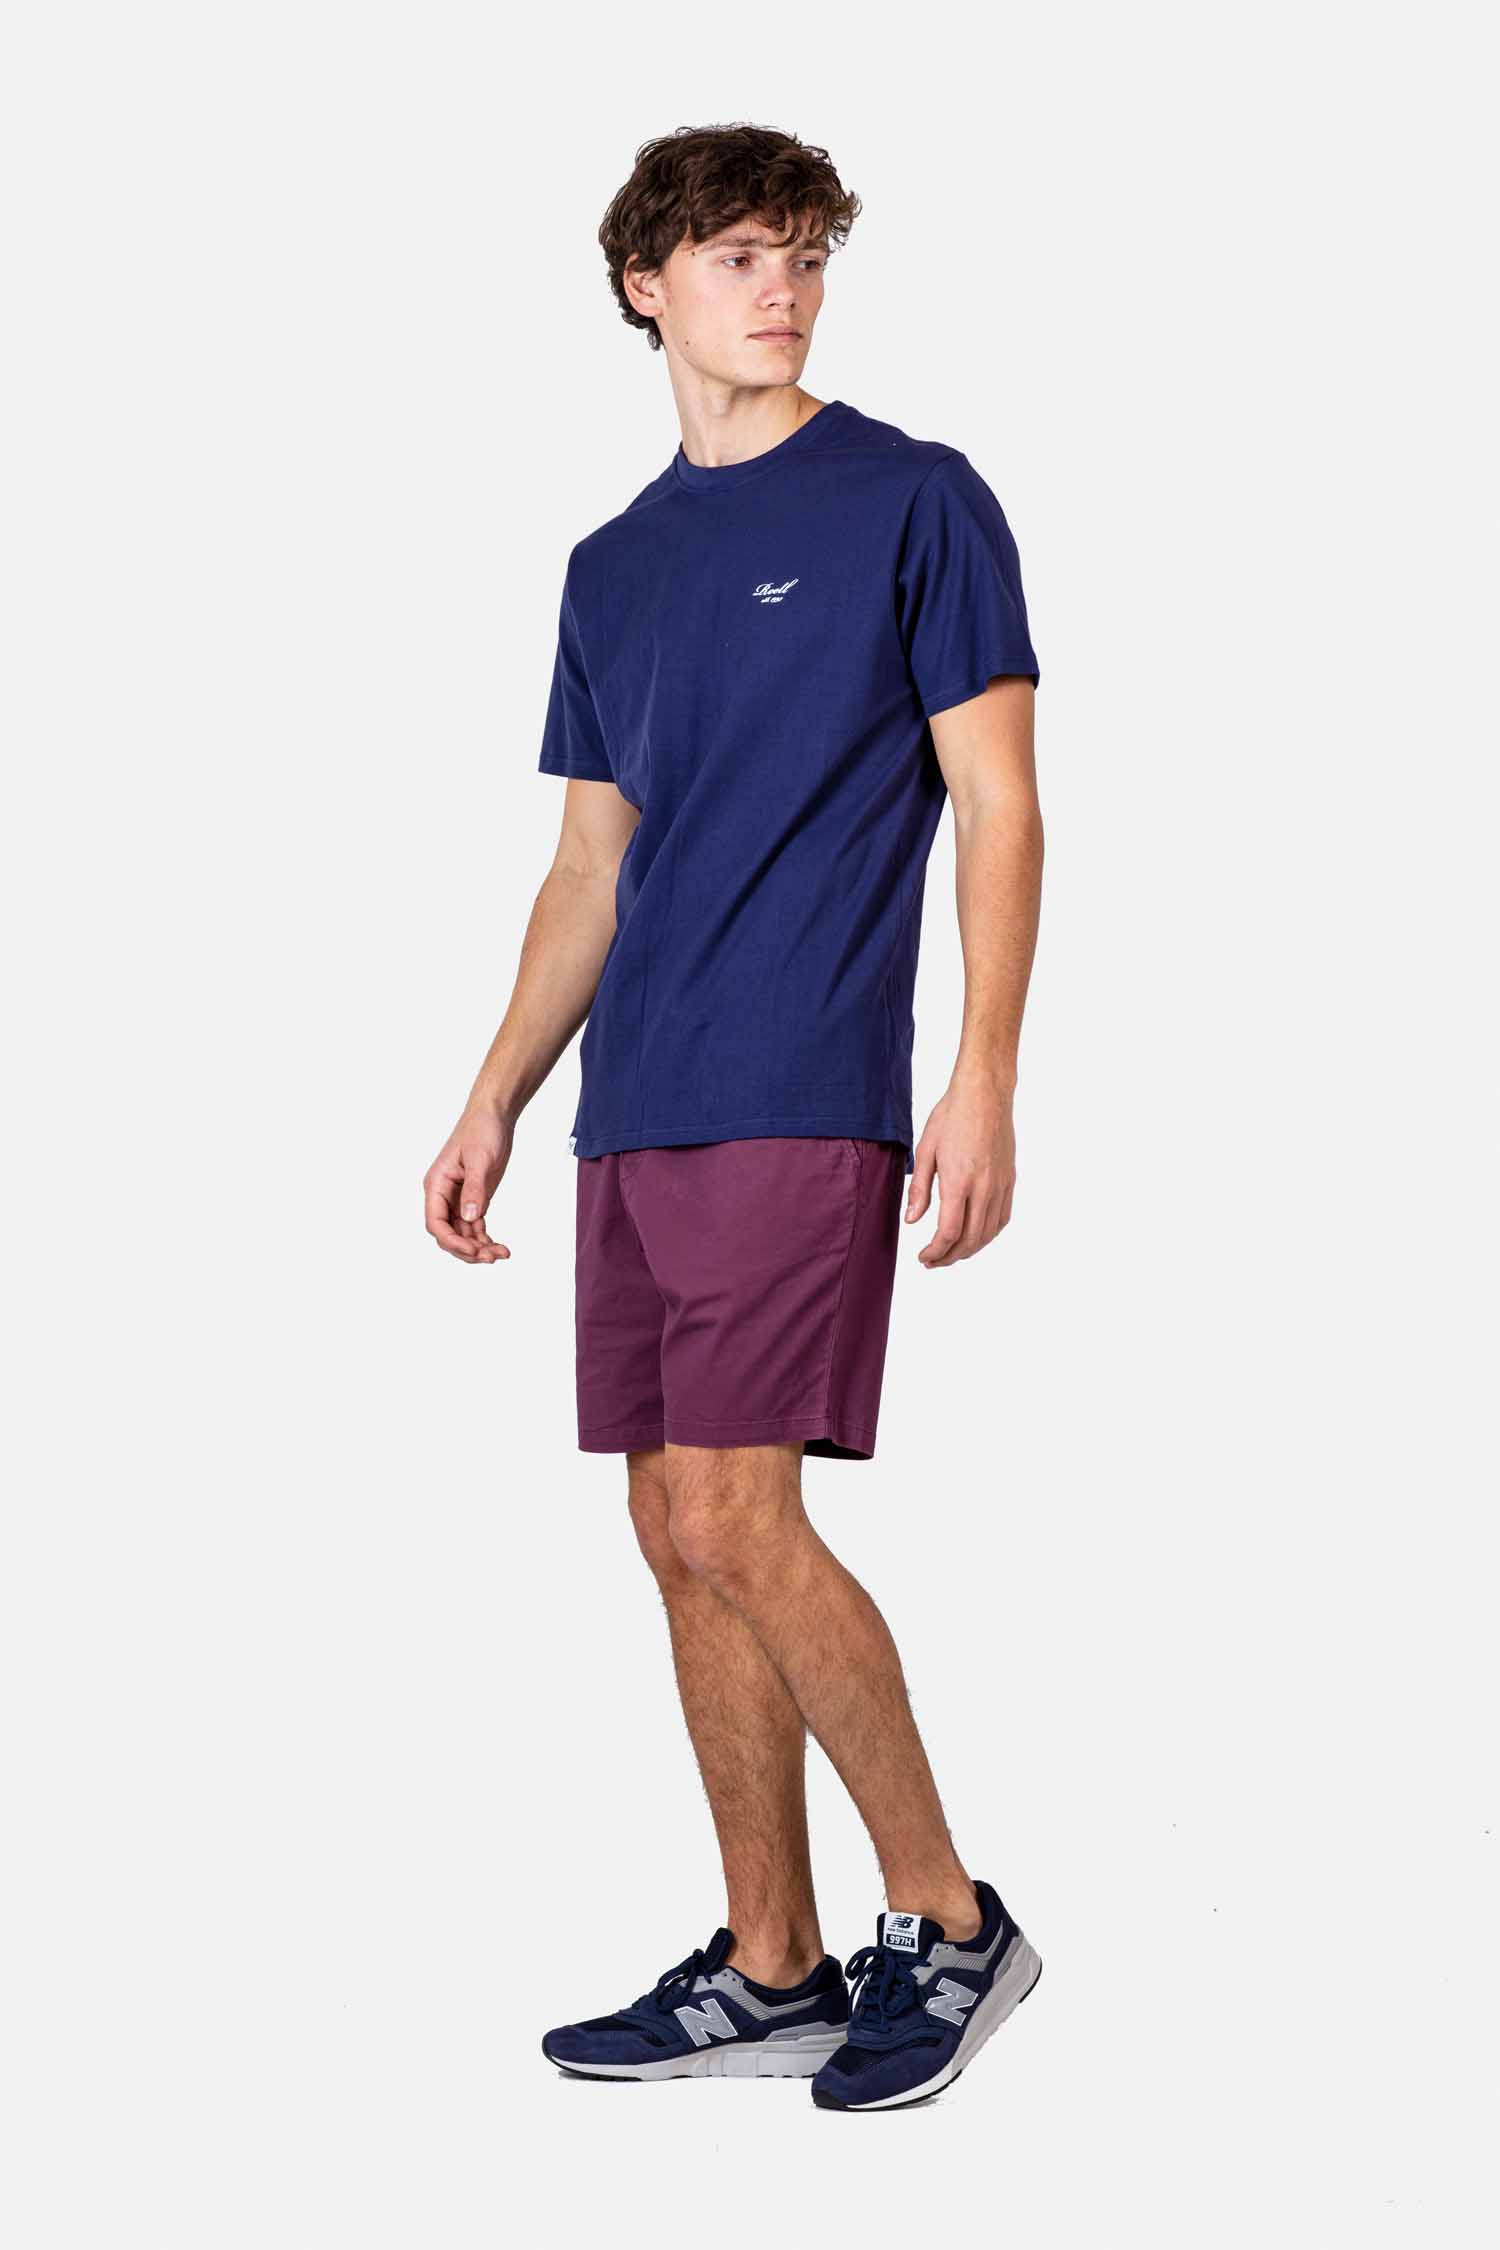 REELL-REFLEX-EASY-SHORT-LW-Short-Hose-plum-purple-3